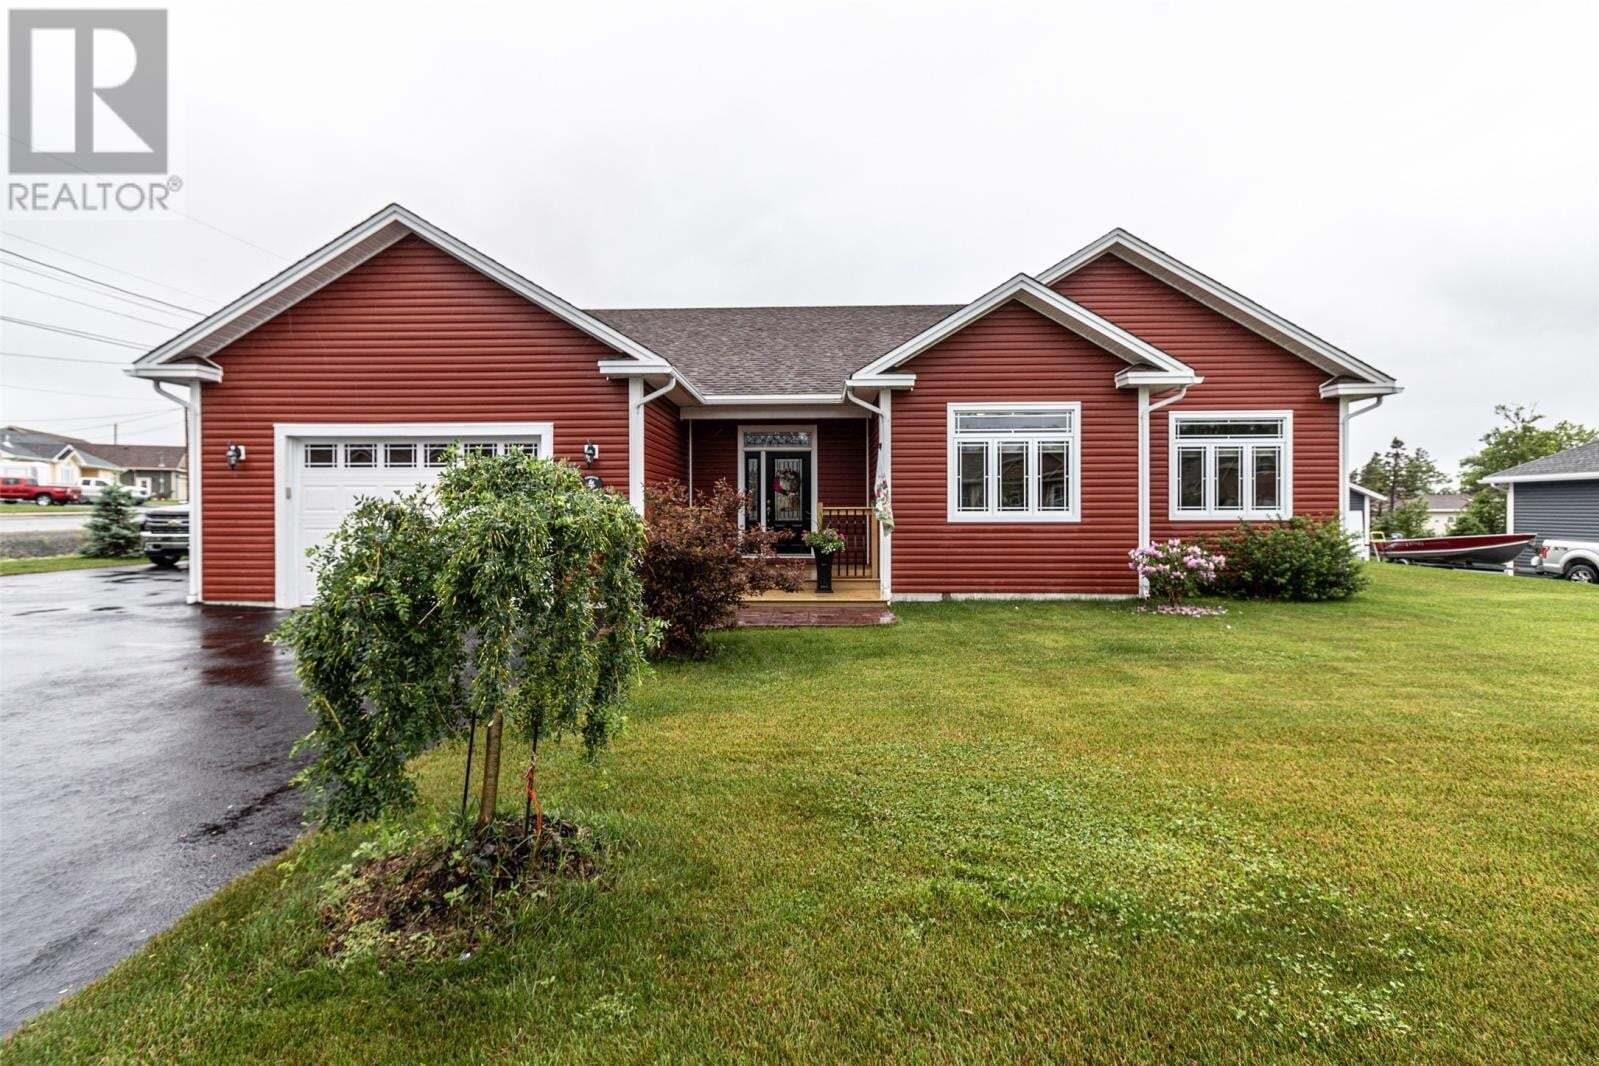 House for sale at 4 Saul Dr Holyrood Newfoundland - MLS: 1217067